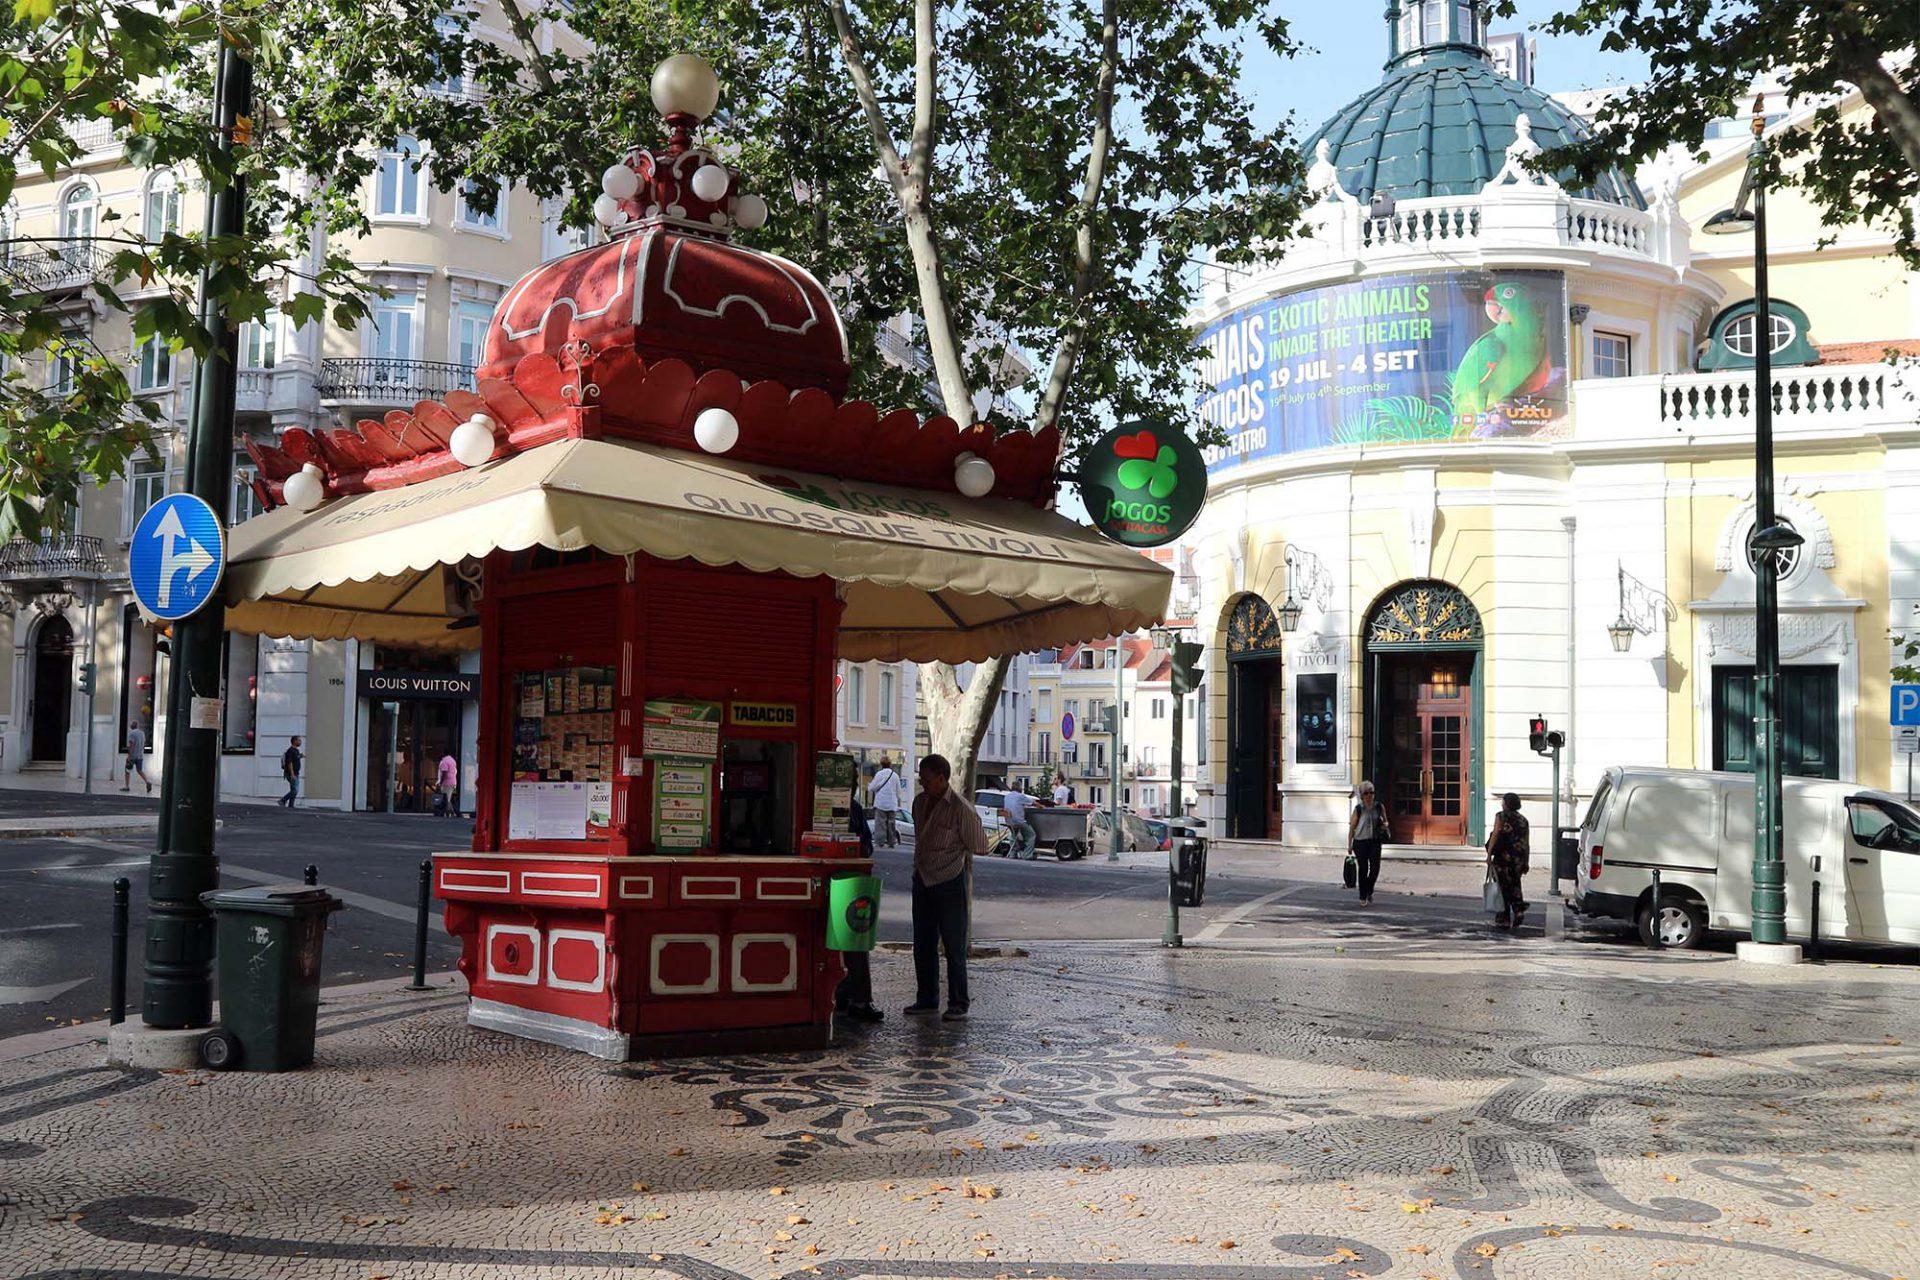 Tivoli Kiosk.  Der knallrote Kiosk wurde 1925 gegenüber des Teatro Tivolis in der Avenida da Liberdade errichtet.